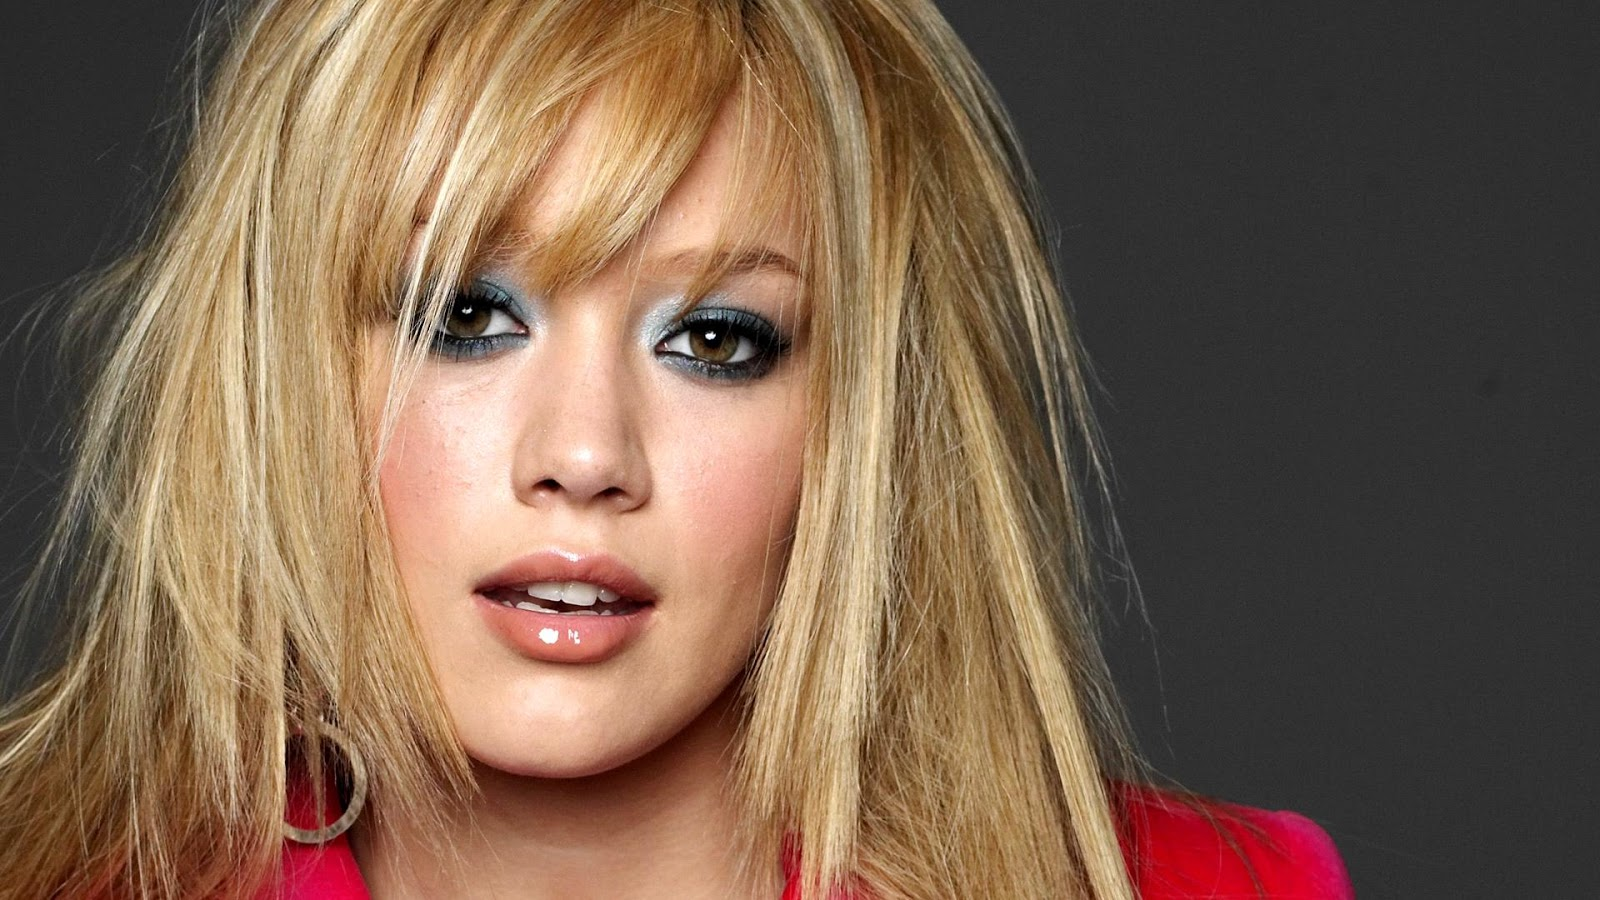 Hilary Duff in Makeup